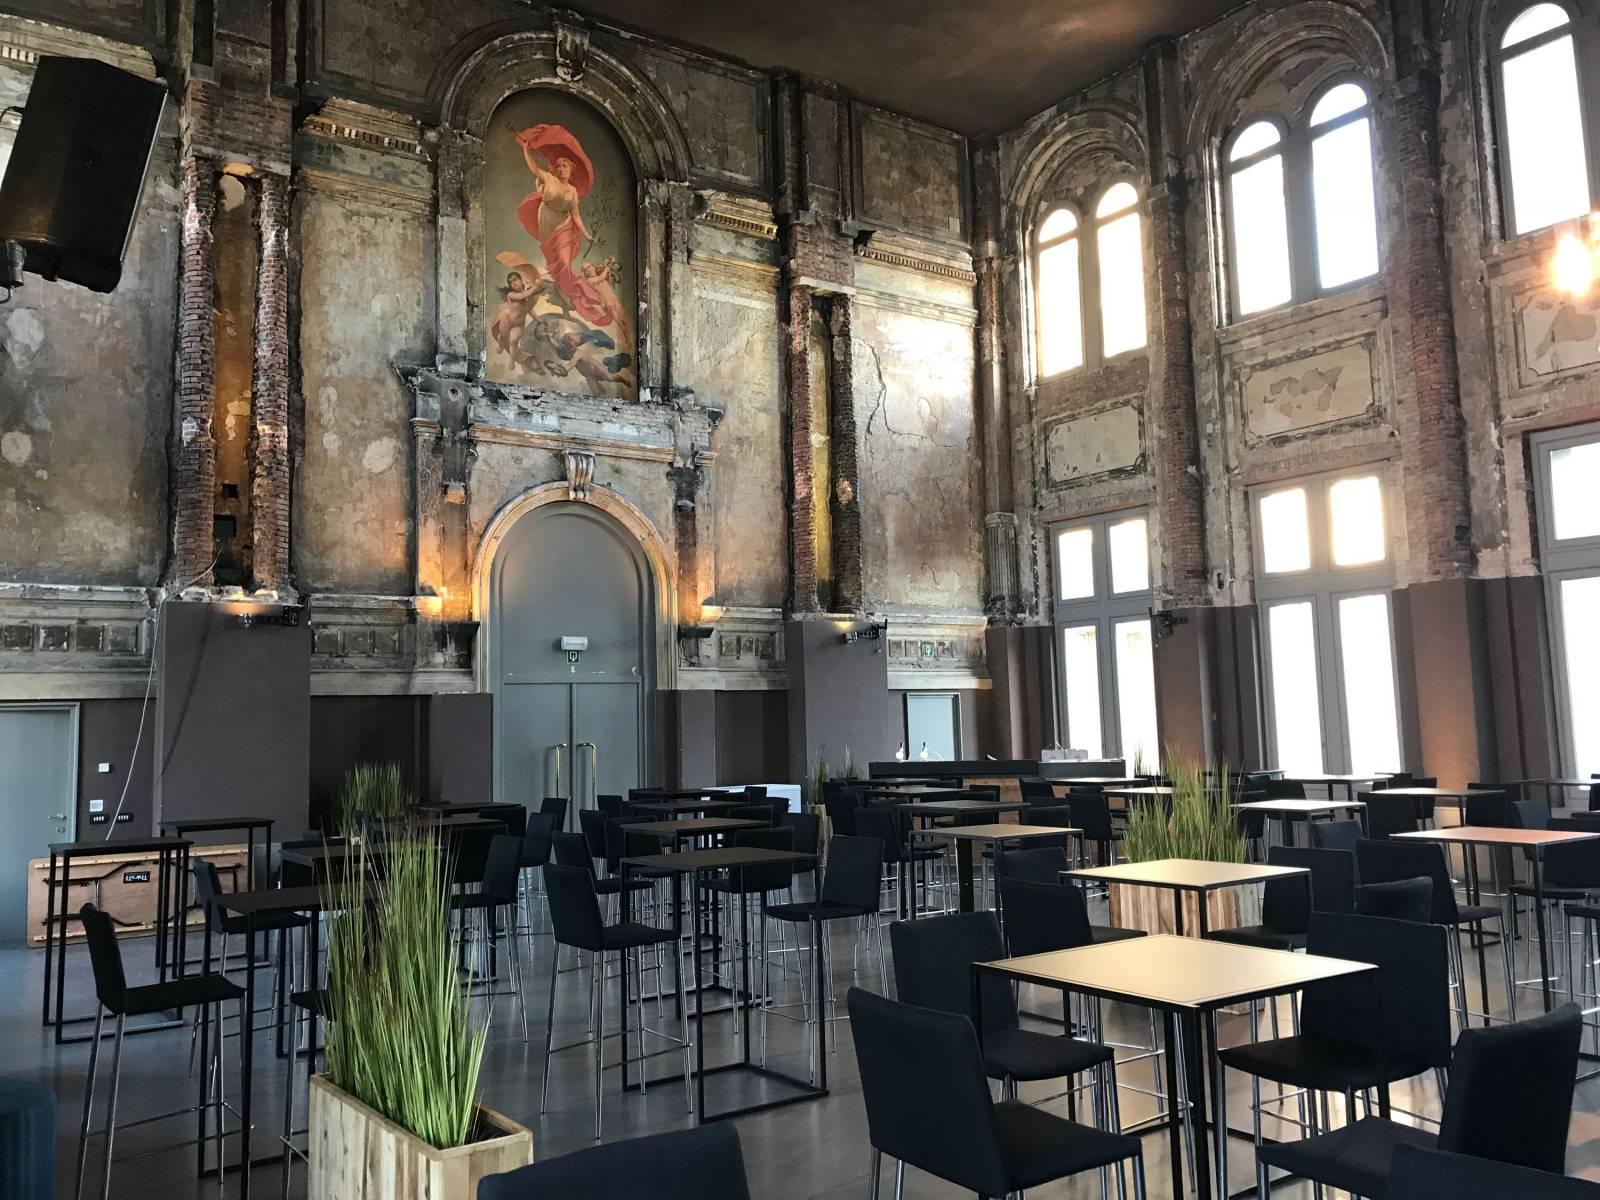 Zaal AthenA - Feestzaal - Trouwzaal - Antwerpen - House of Weddings - 36